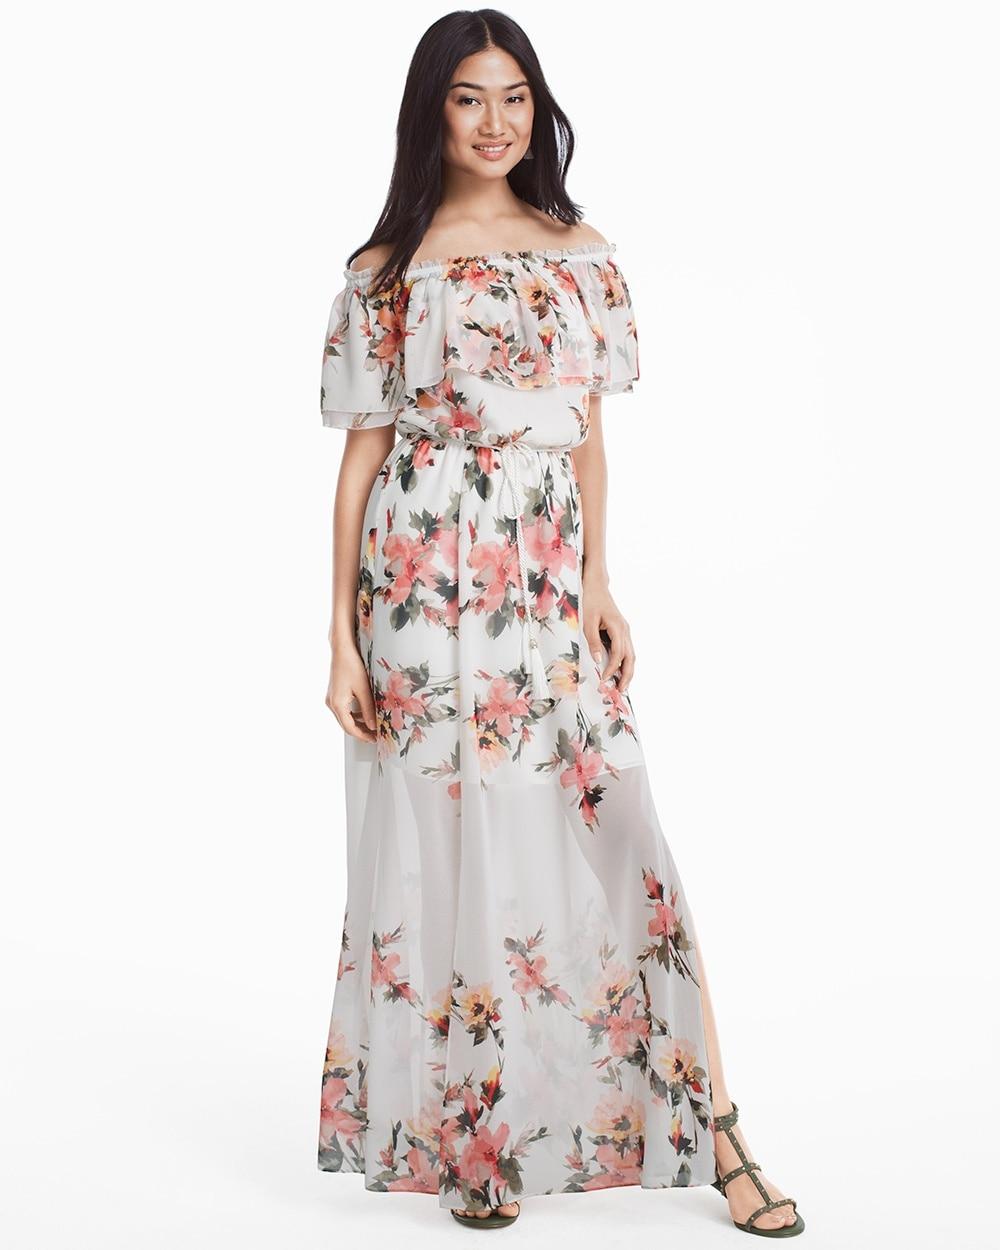 Floral White Maxi Dress